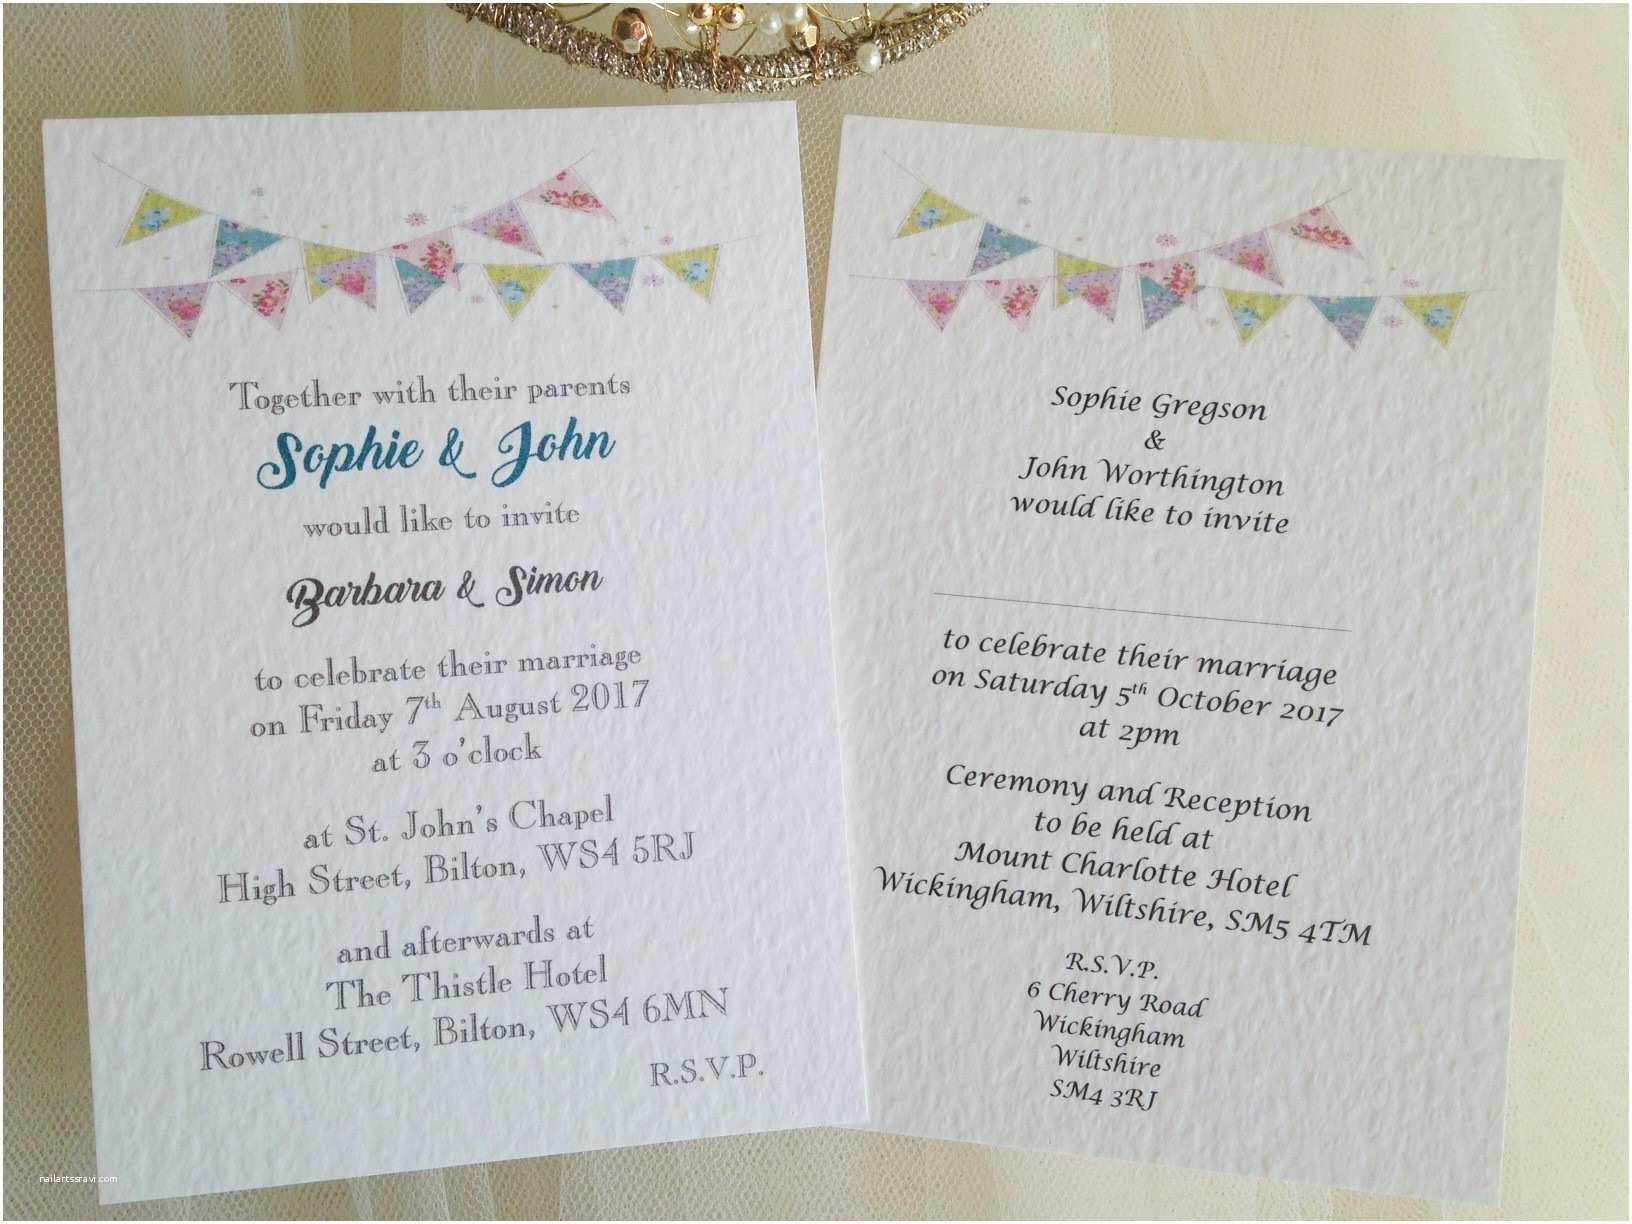 Wedding Invitation Stationery Wedding Invitations Under £1 Daisy Chain Invites